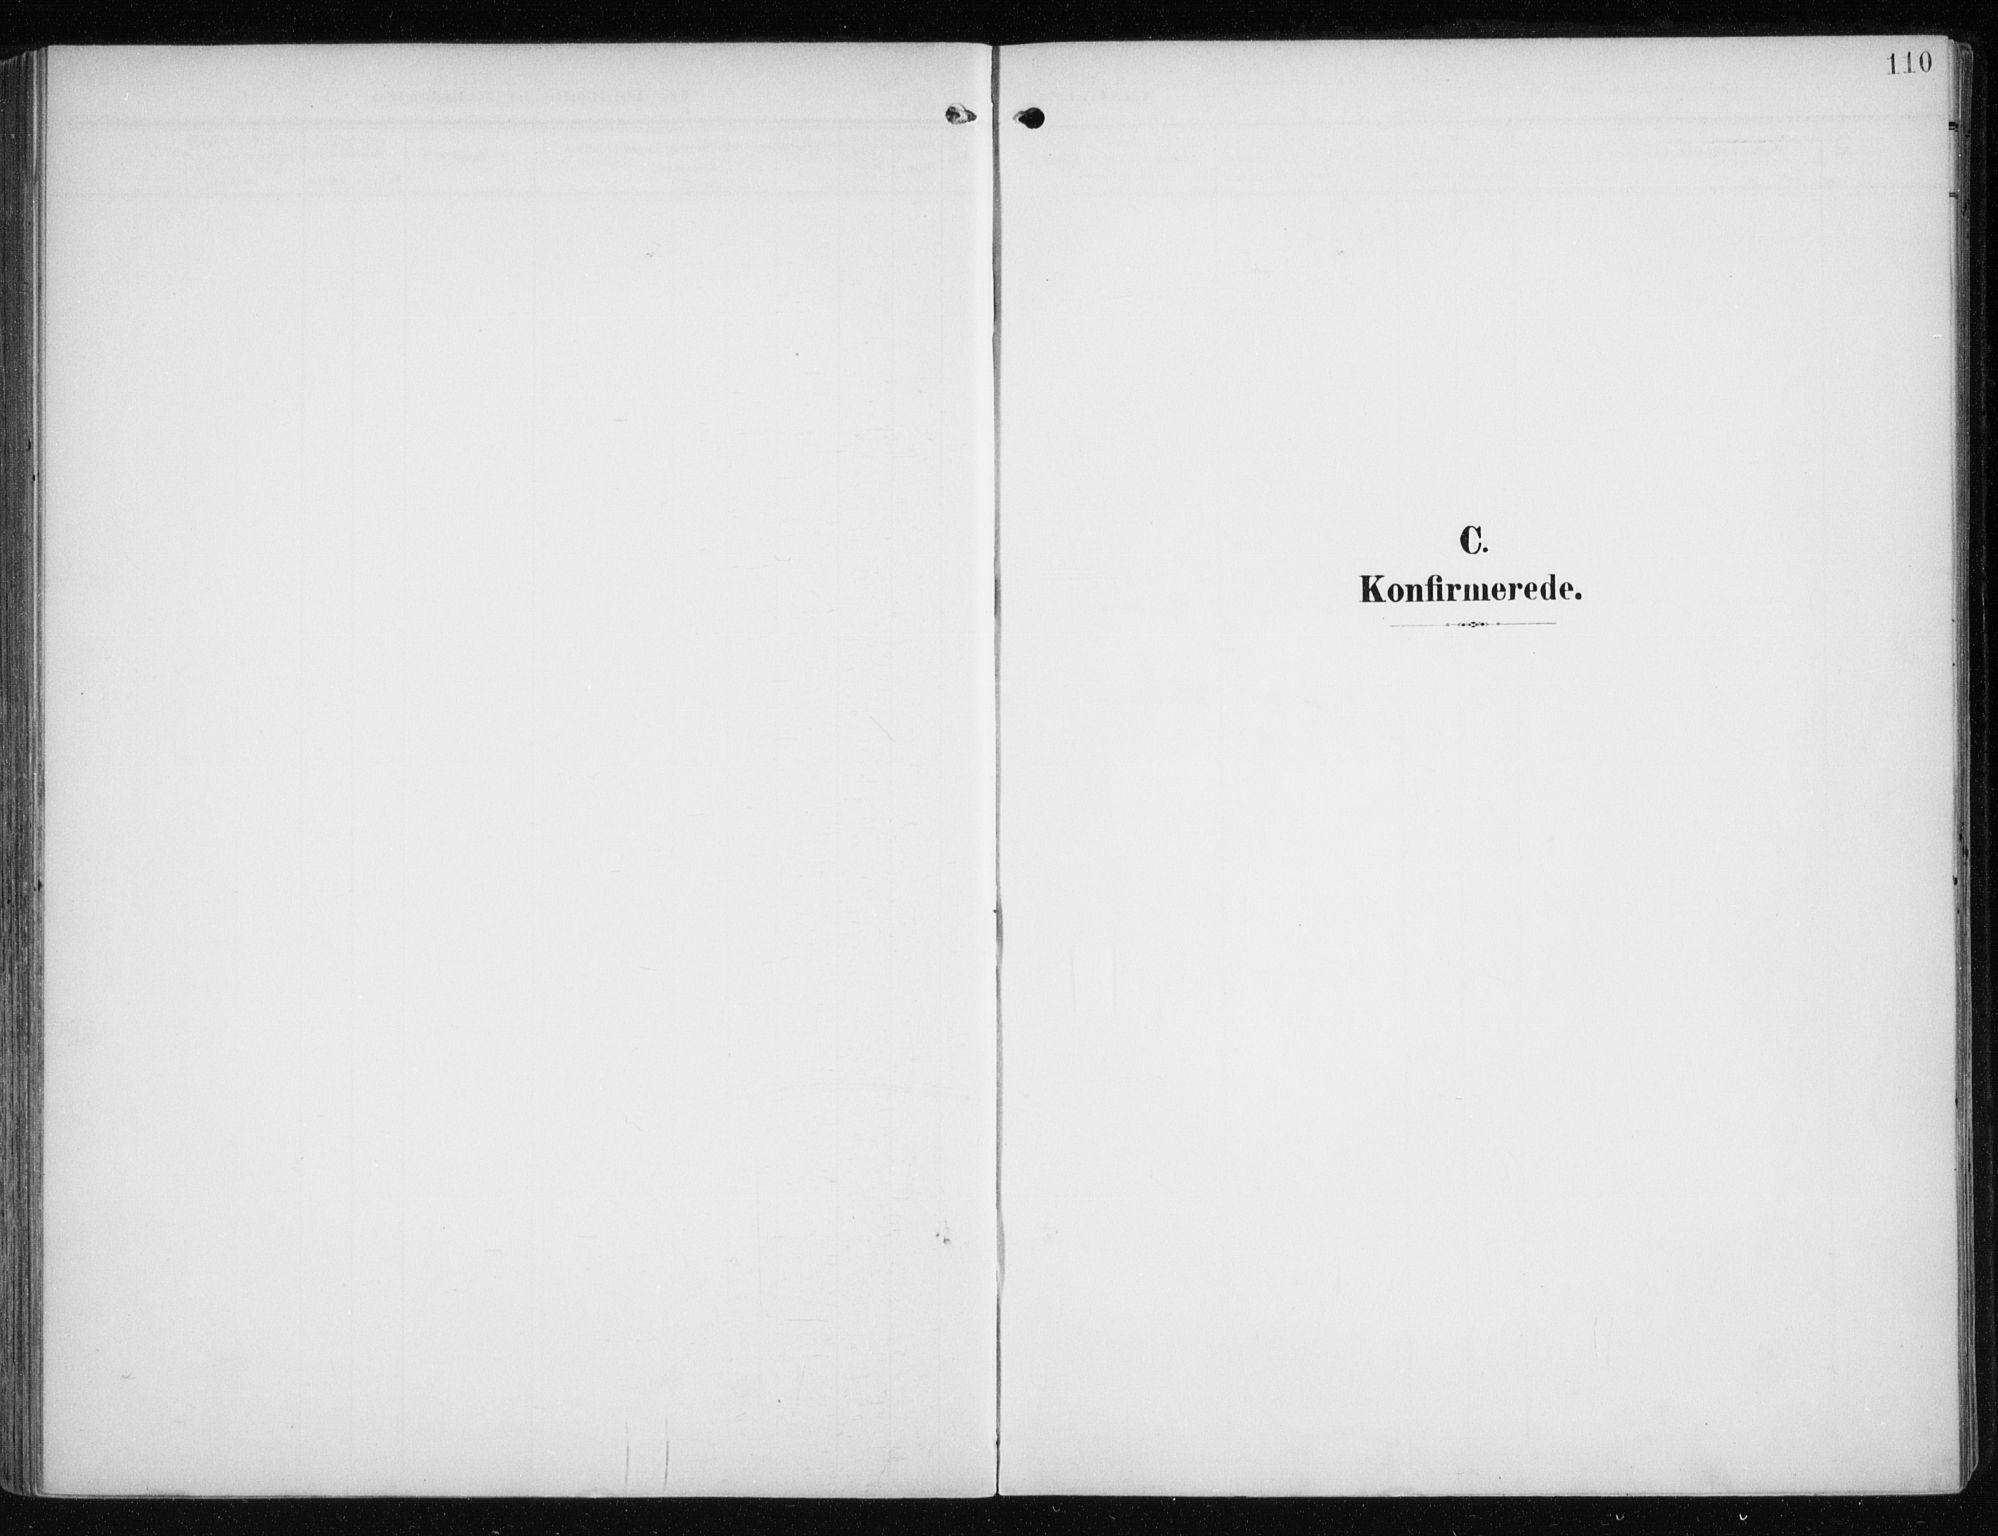 SATØ, Måsøy sokneprestkontor, H/Ha/L0009kirke: Ministerialbok nr. 9, 1903-1914, s. 110